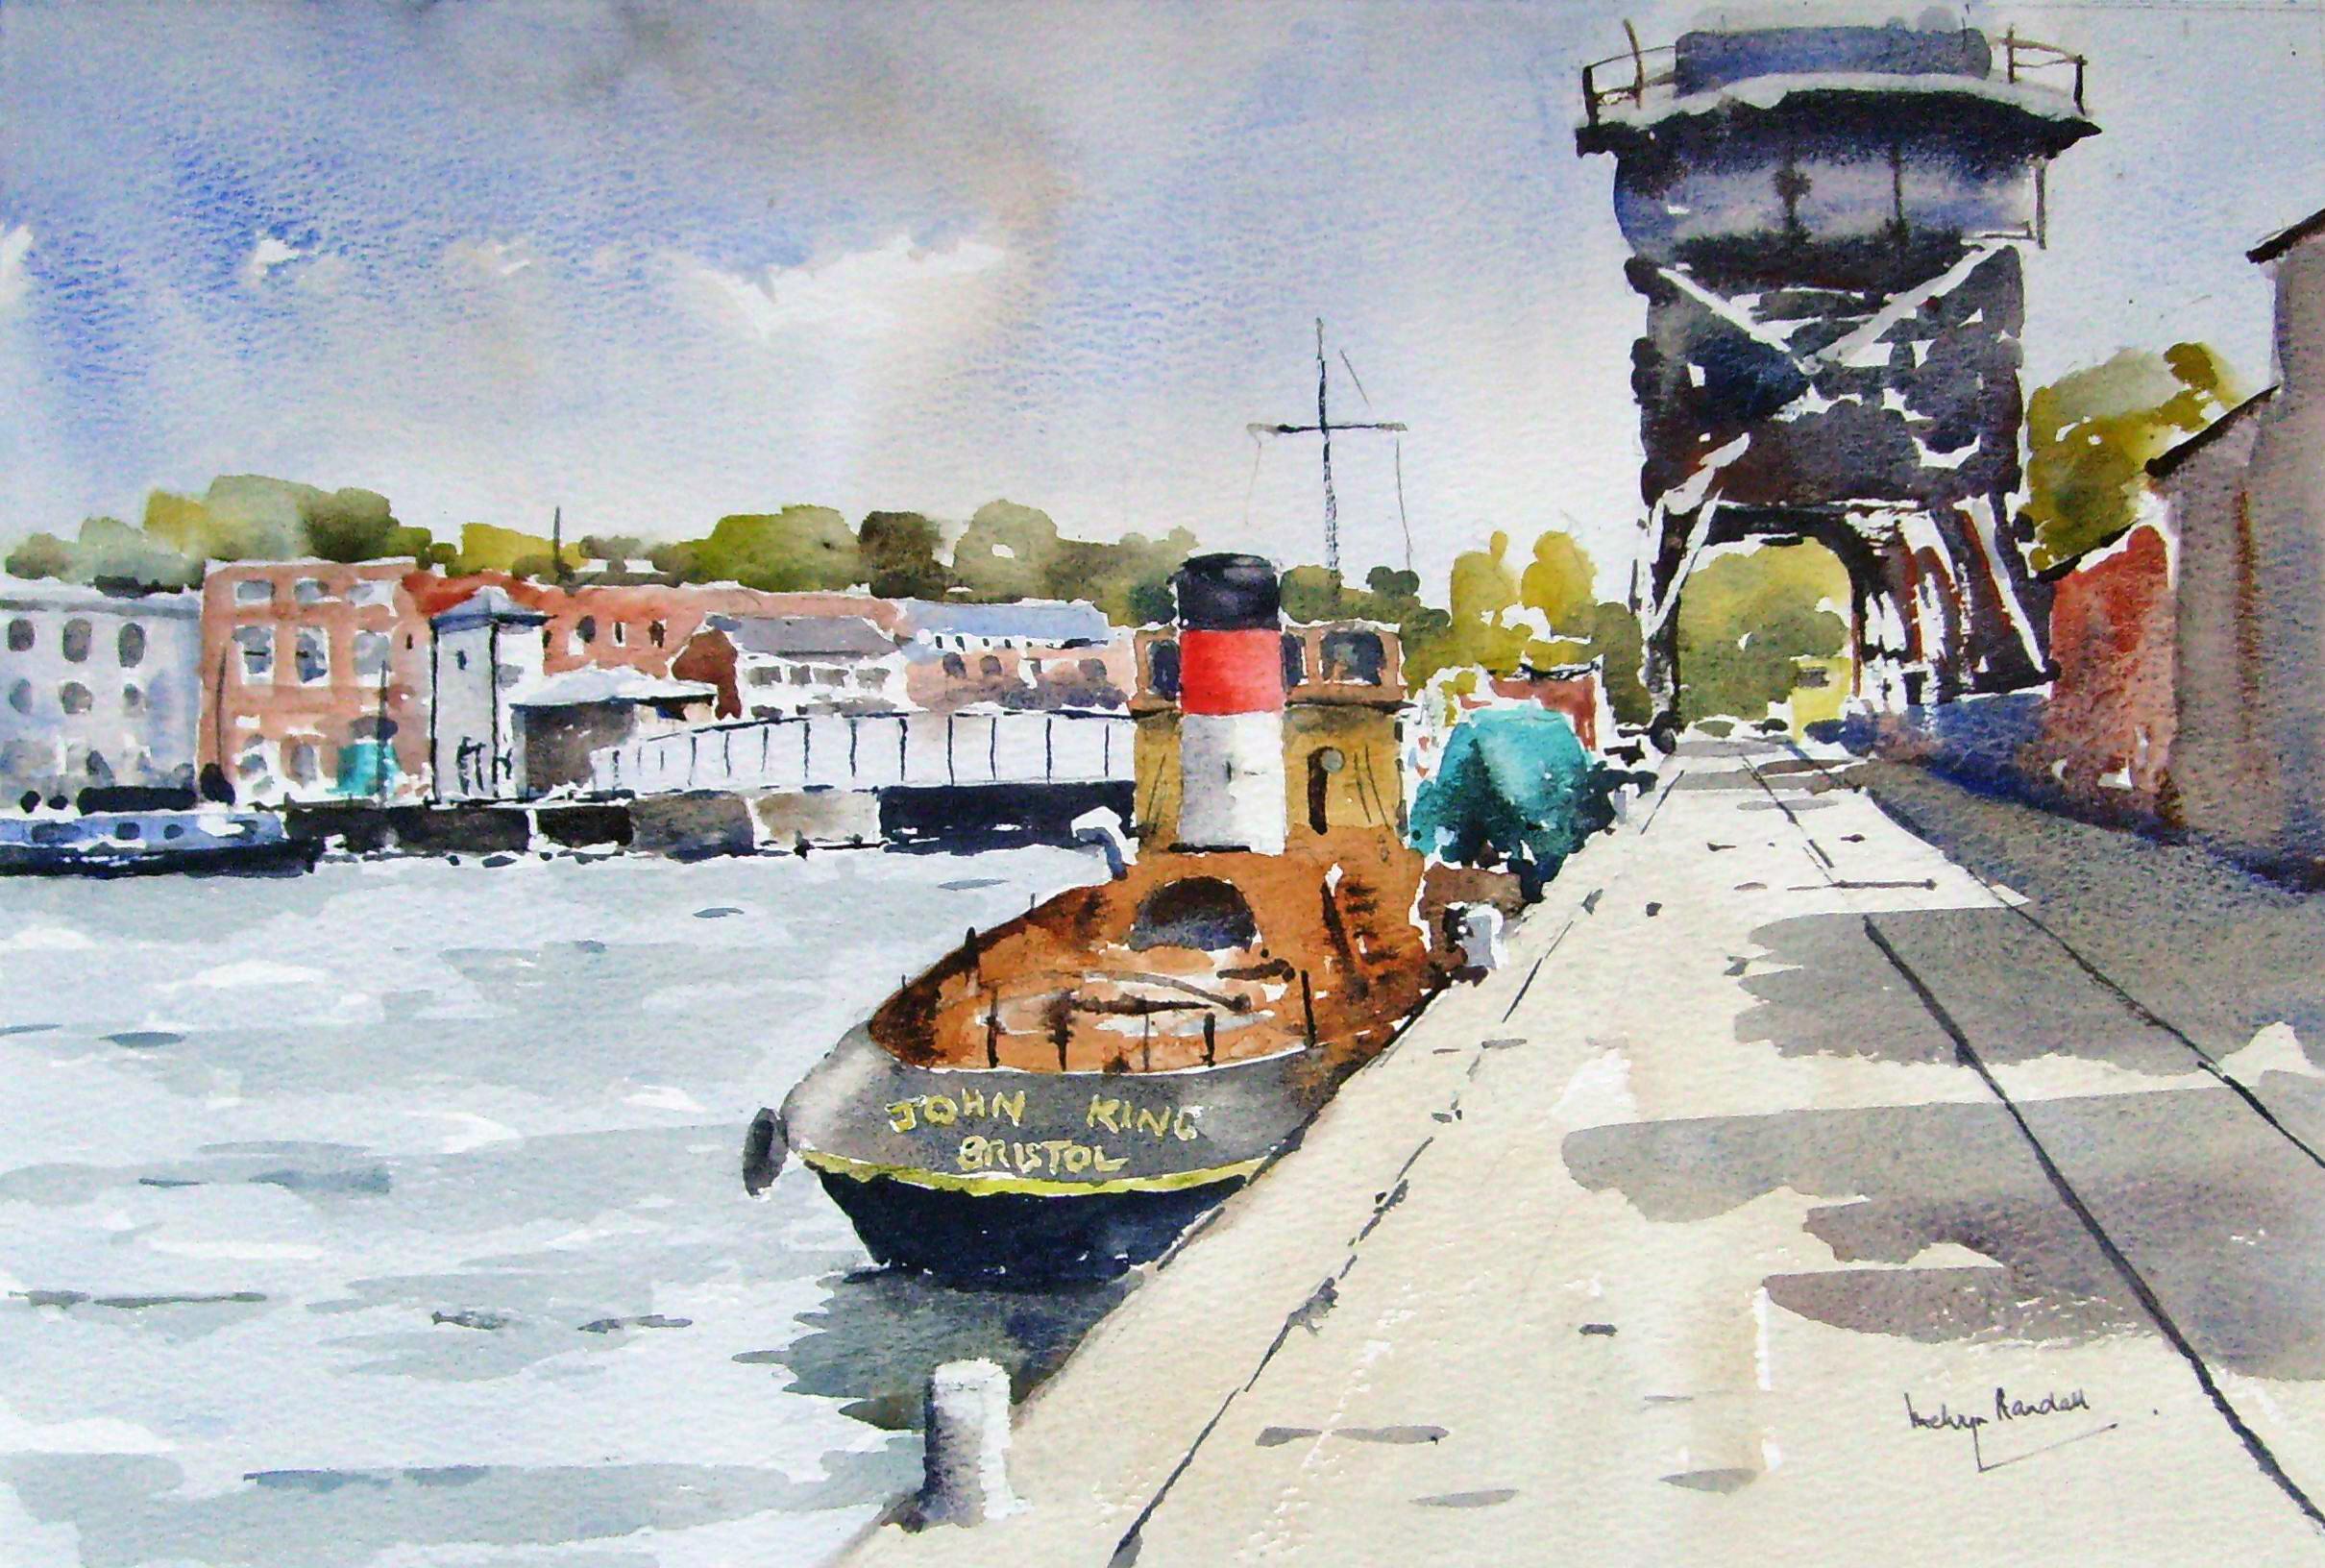 John King Tug, Bristol City Docks